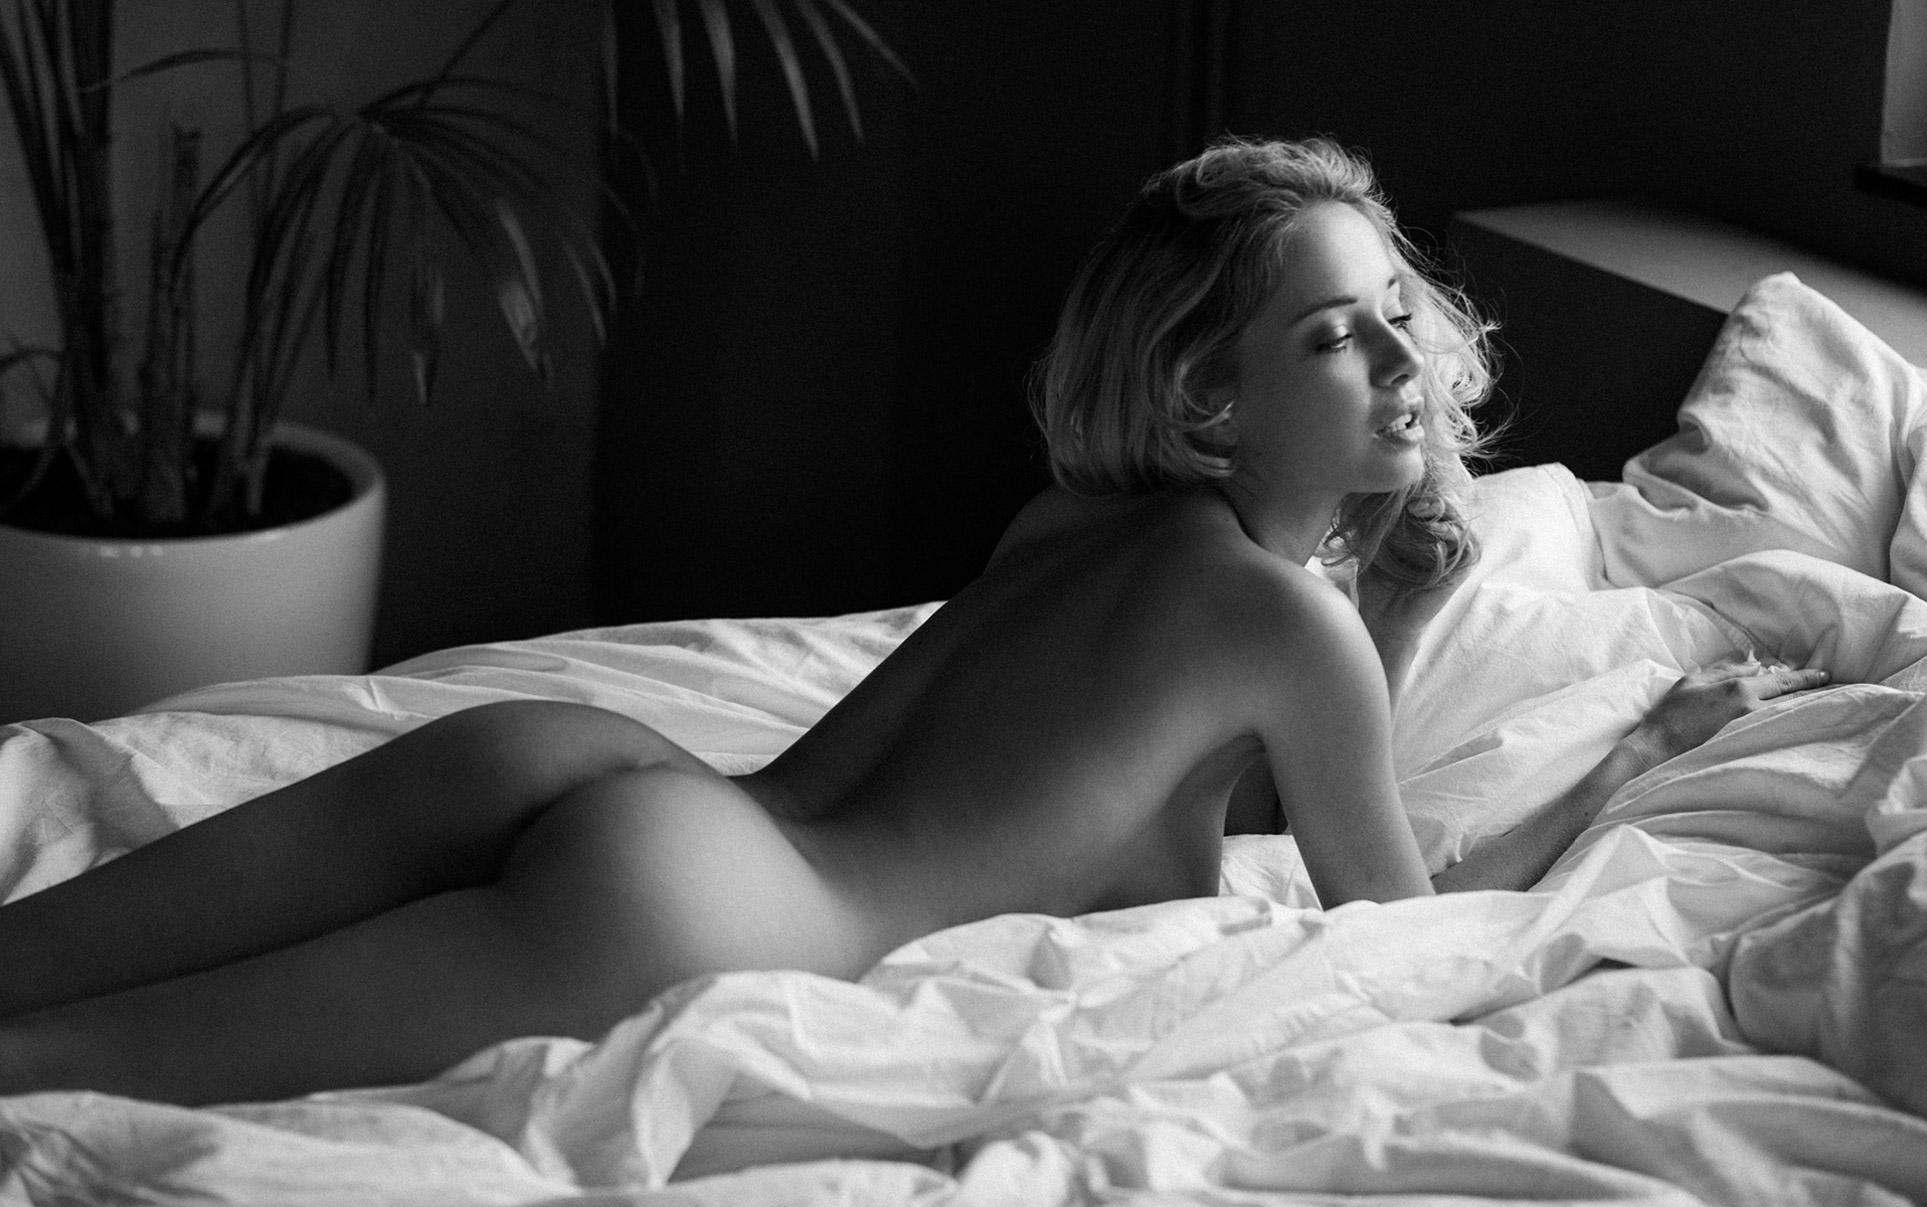 From Joy to Pleasure / Natasha Andreeva nude by Sacha Leyendecker